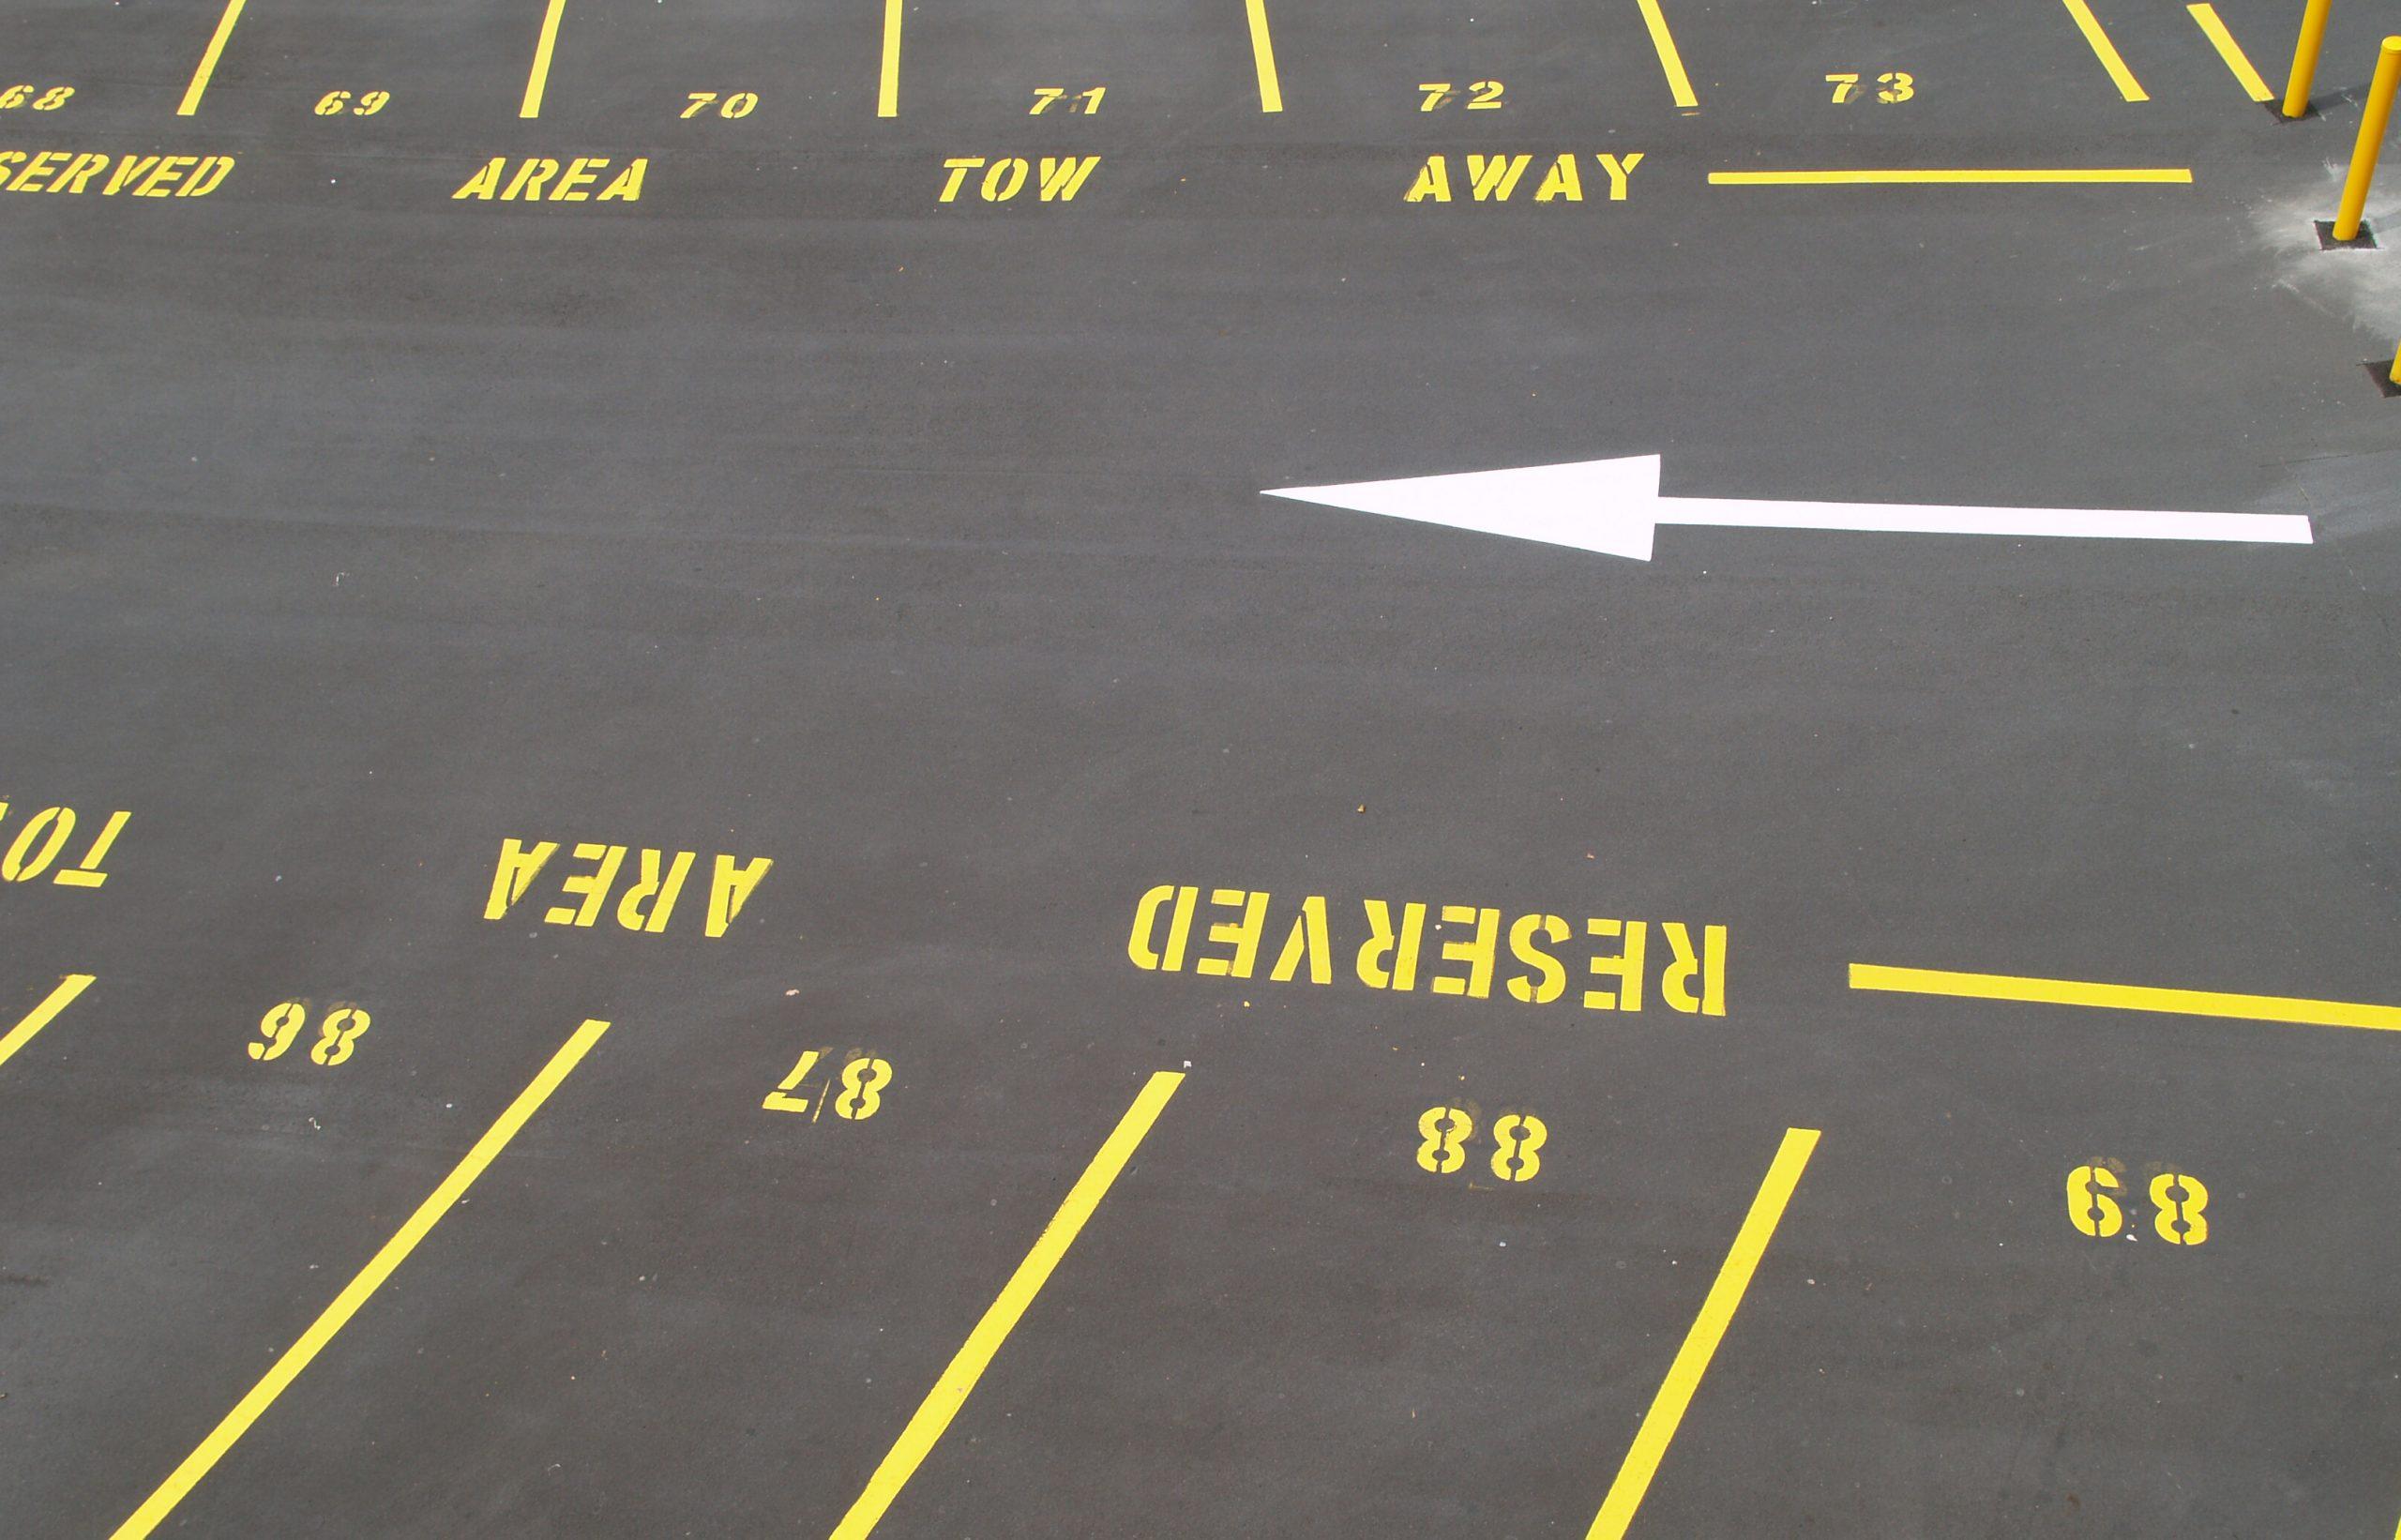 Designated Area, Royal Parking